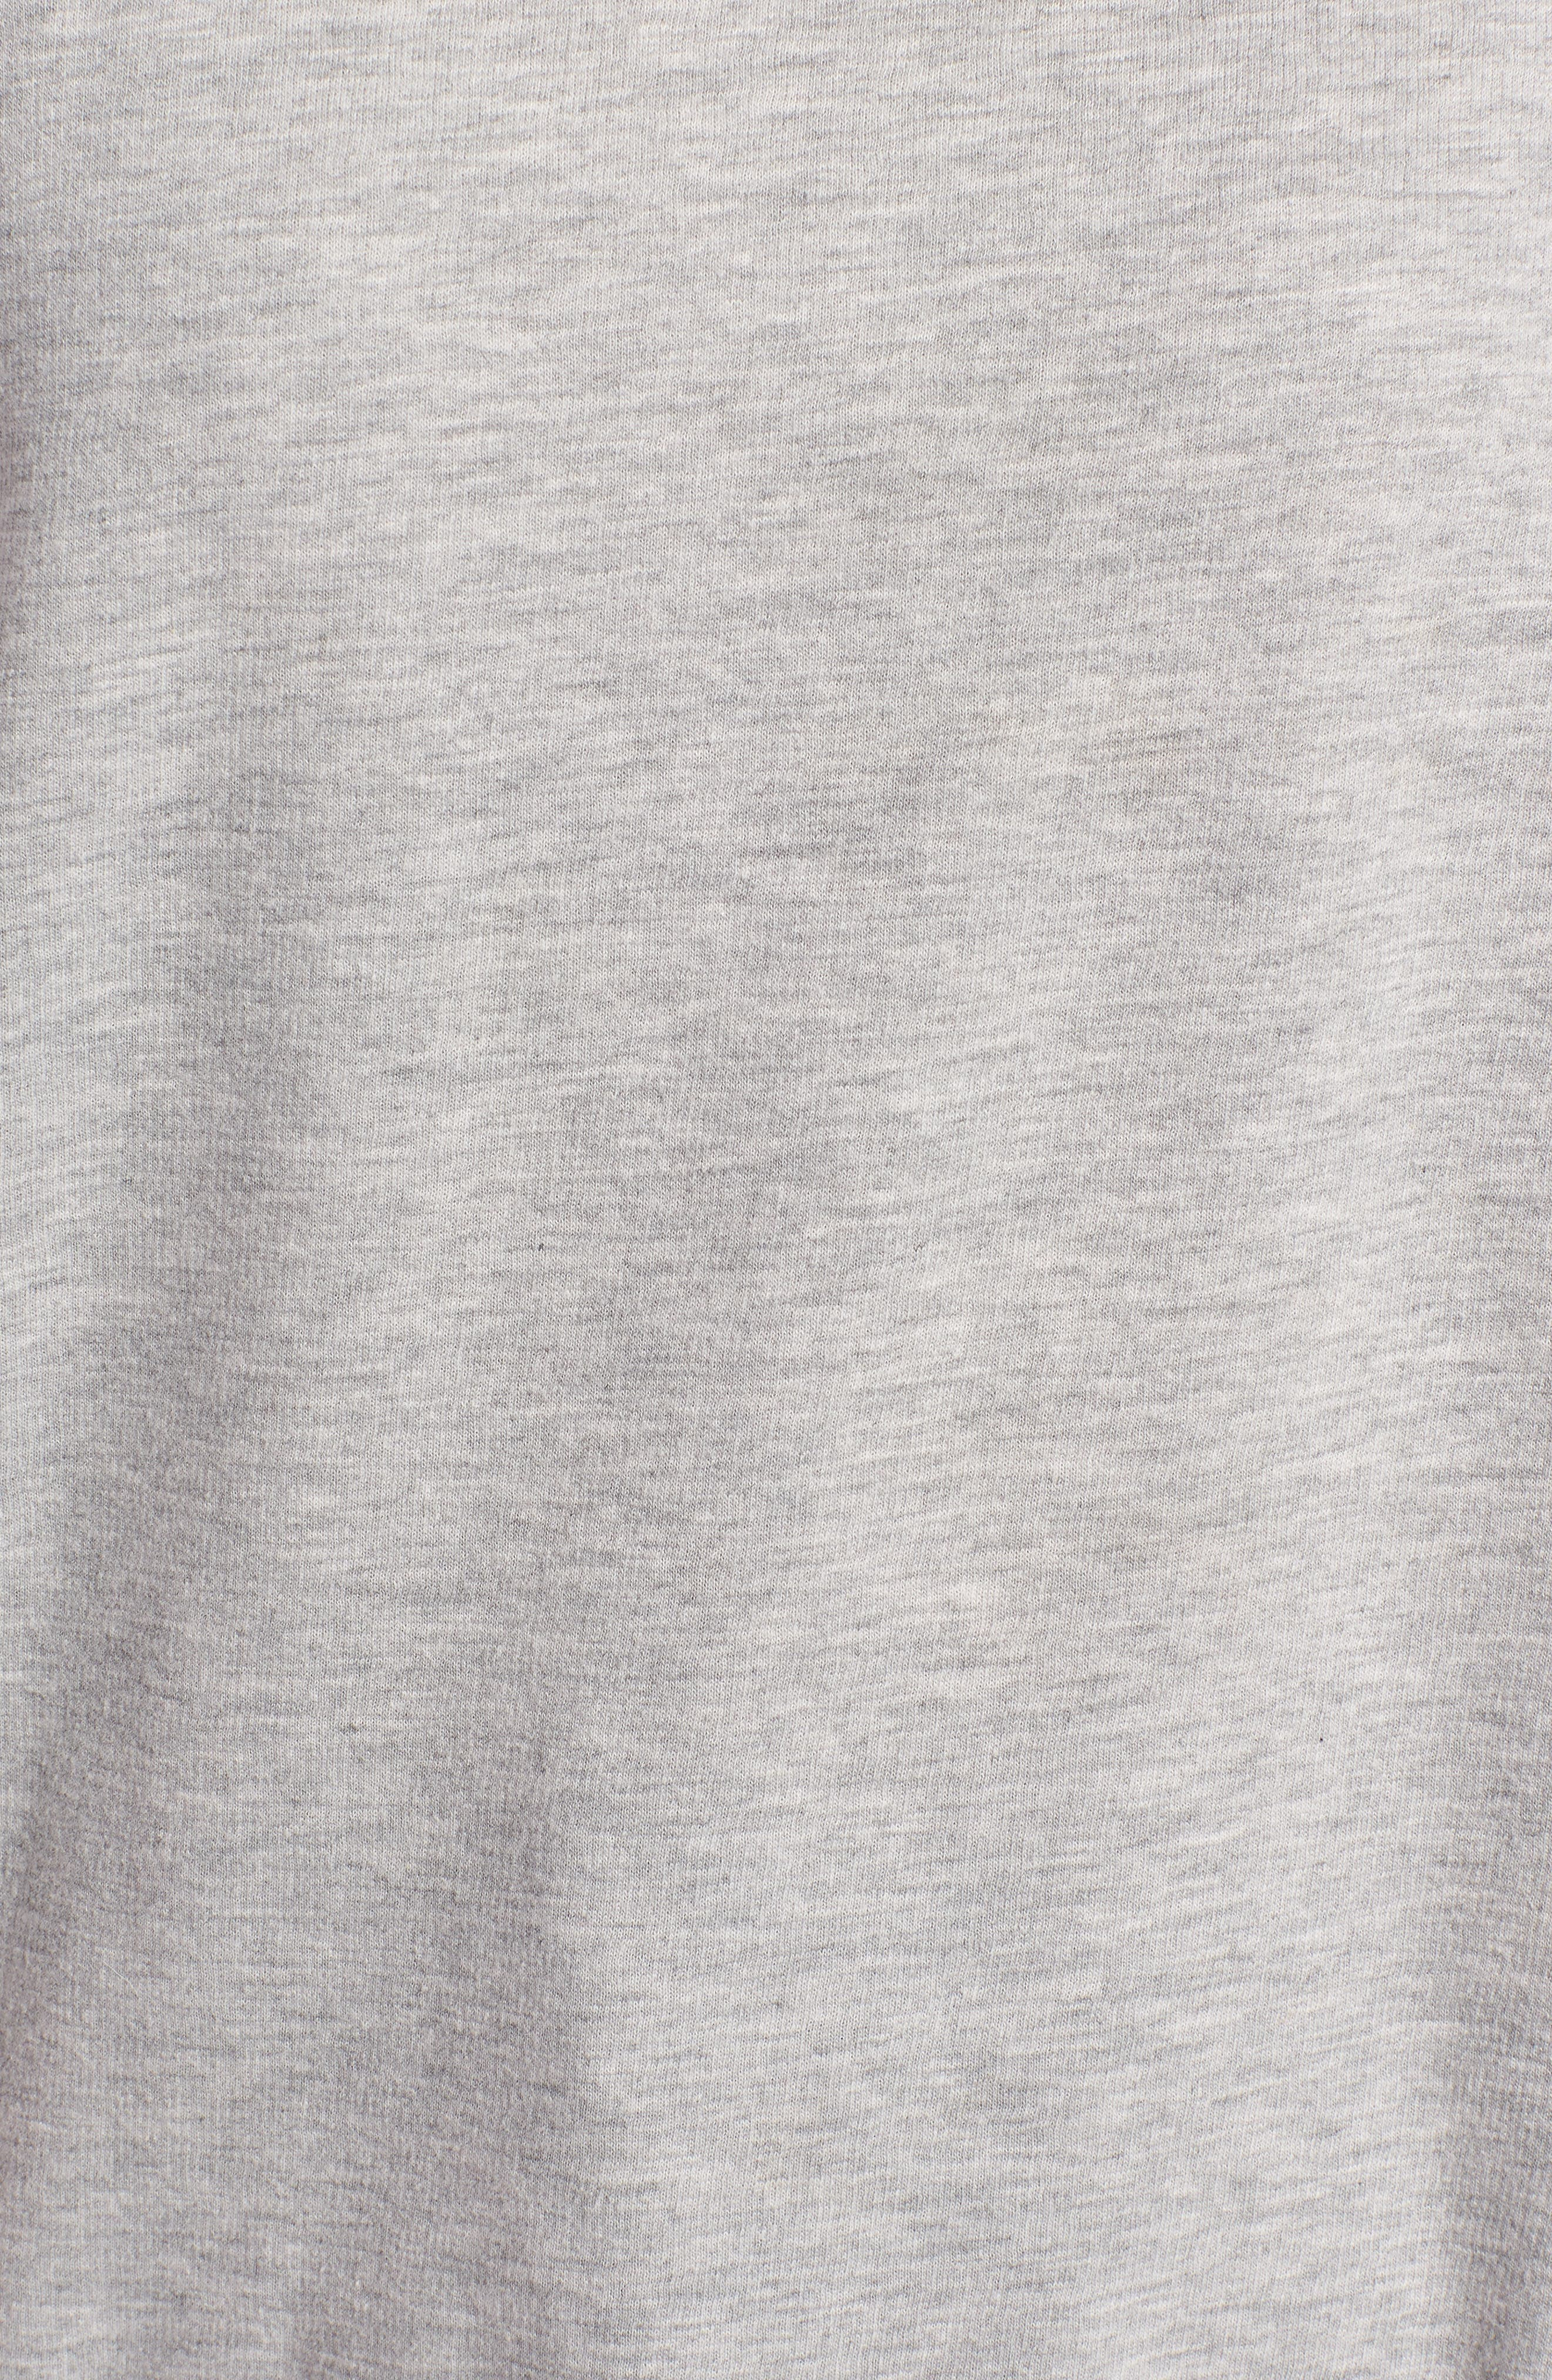 Raglan Sweatshirt,                             Alternate thumbnail 5, color,                             050